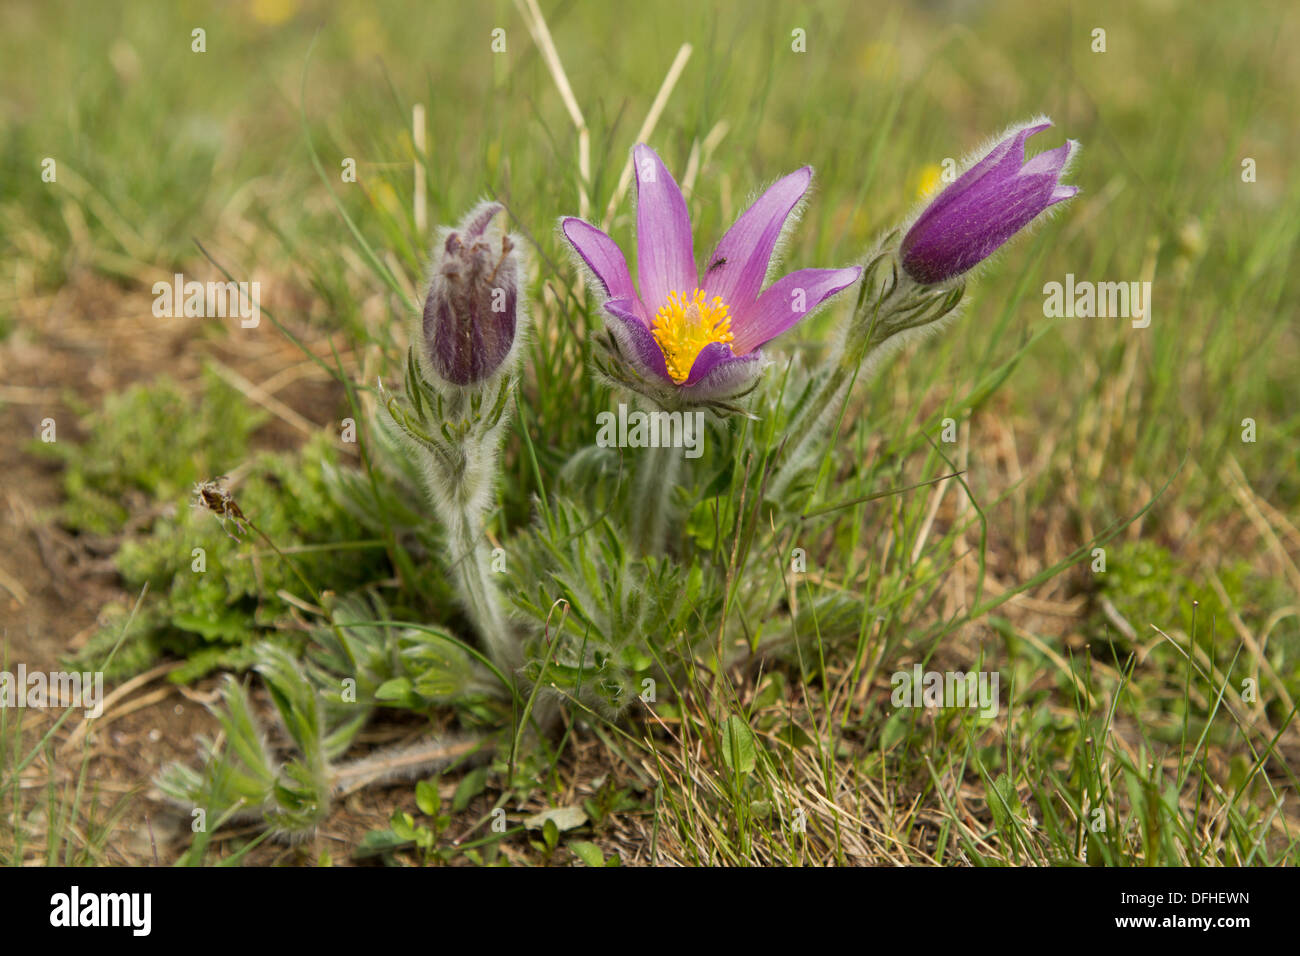 Common Pasque Flower (Pulsatilla vulgaris) - Stock Image